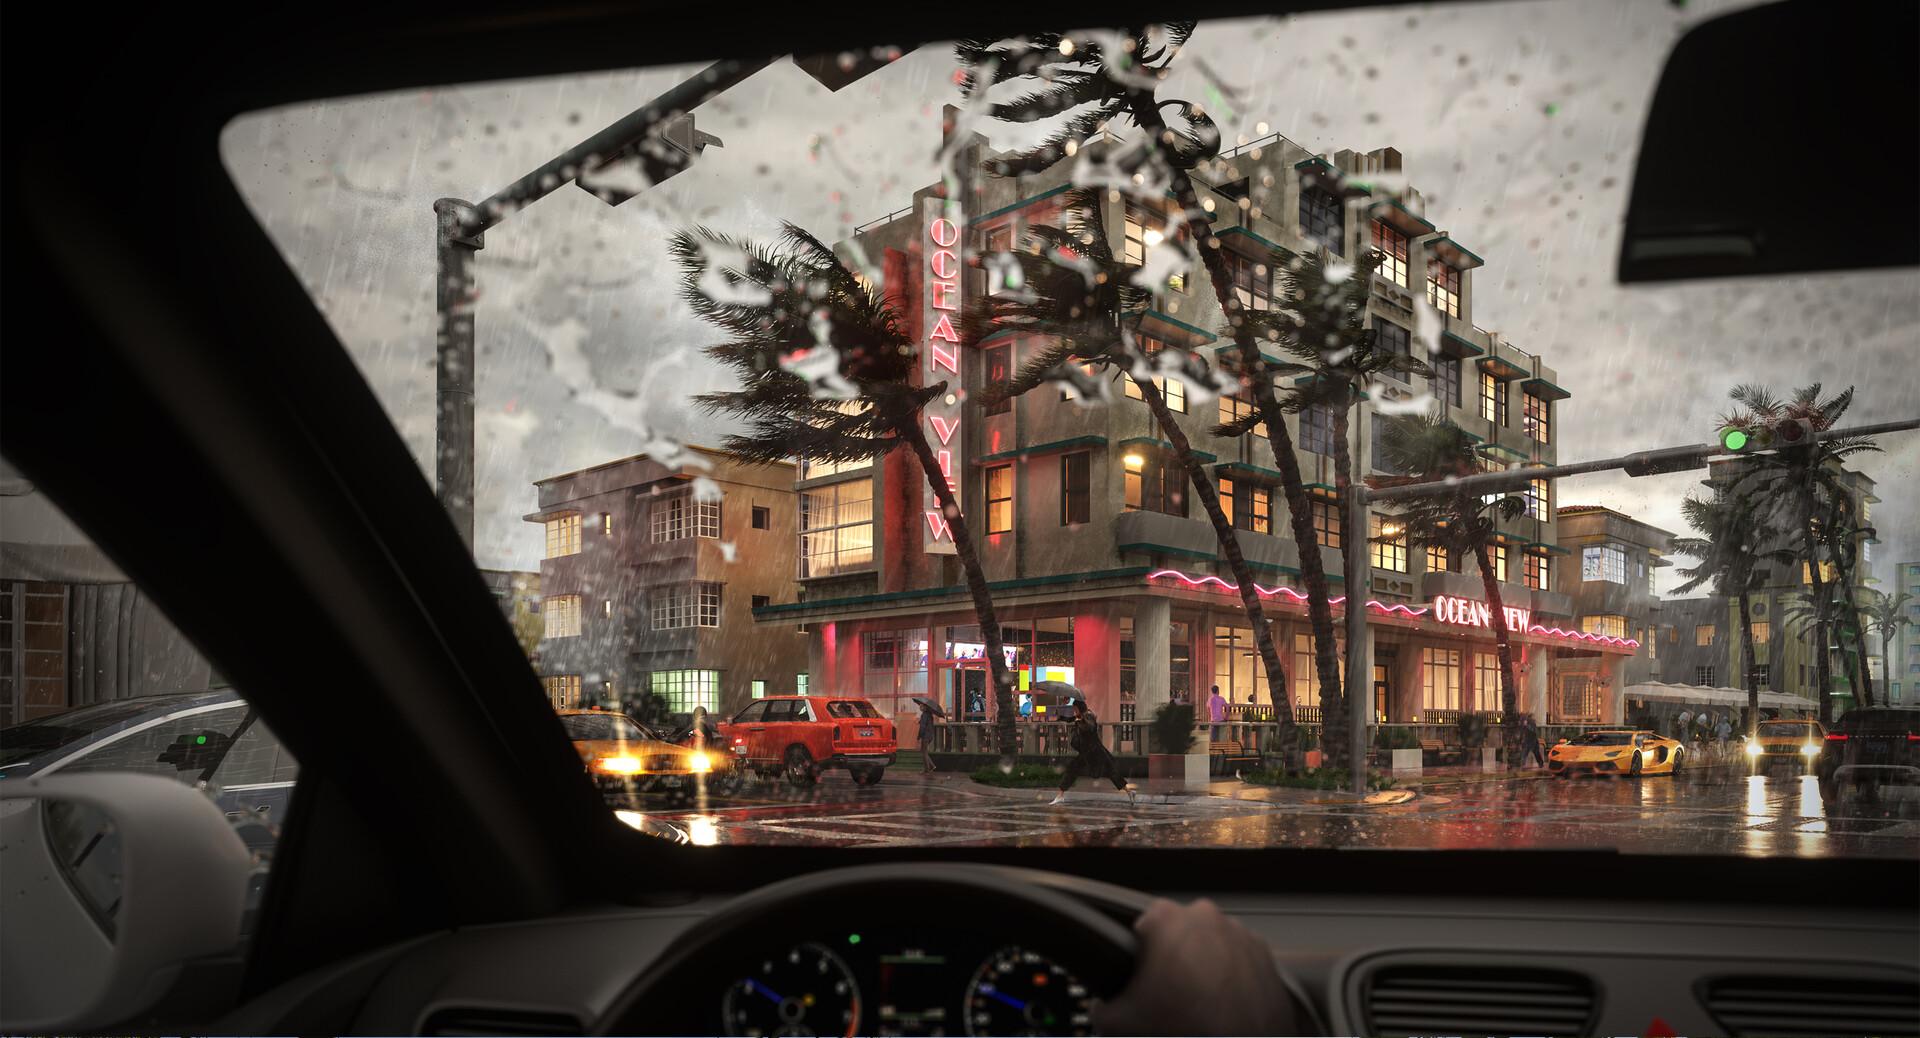 kirill-gilyazov-wide-view-rain-3k.jpg